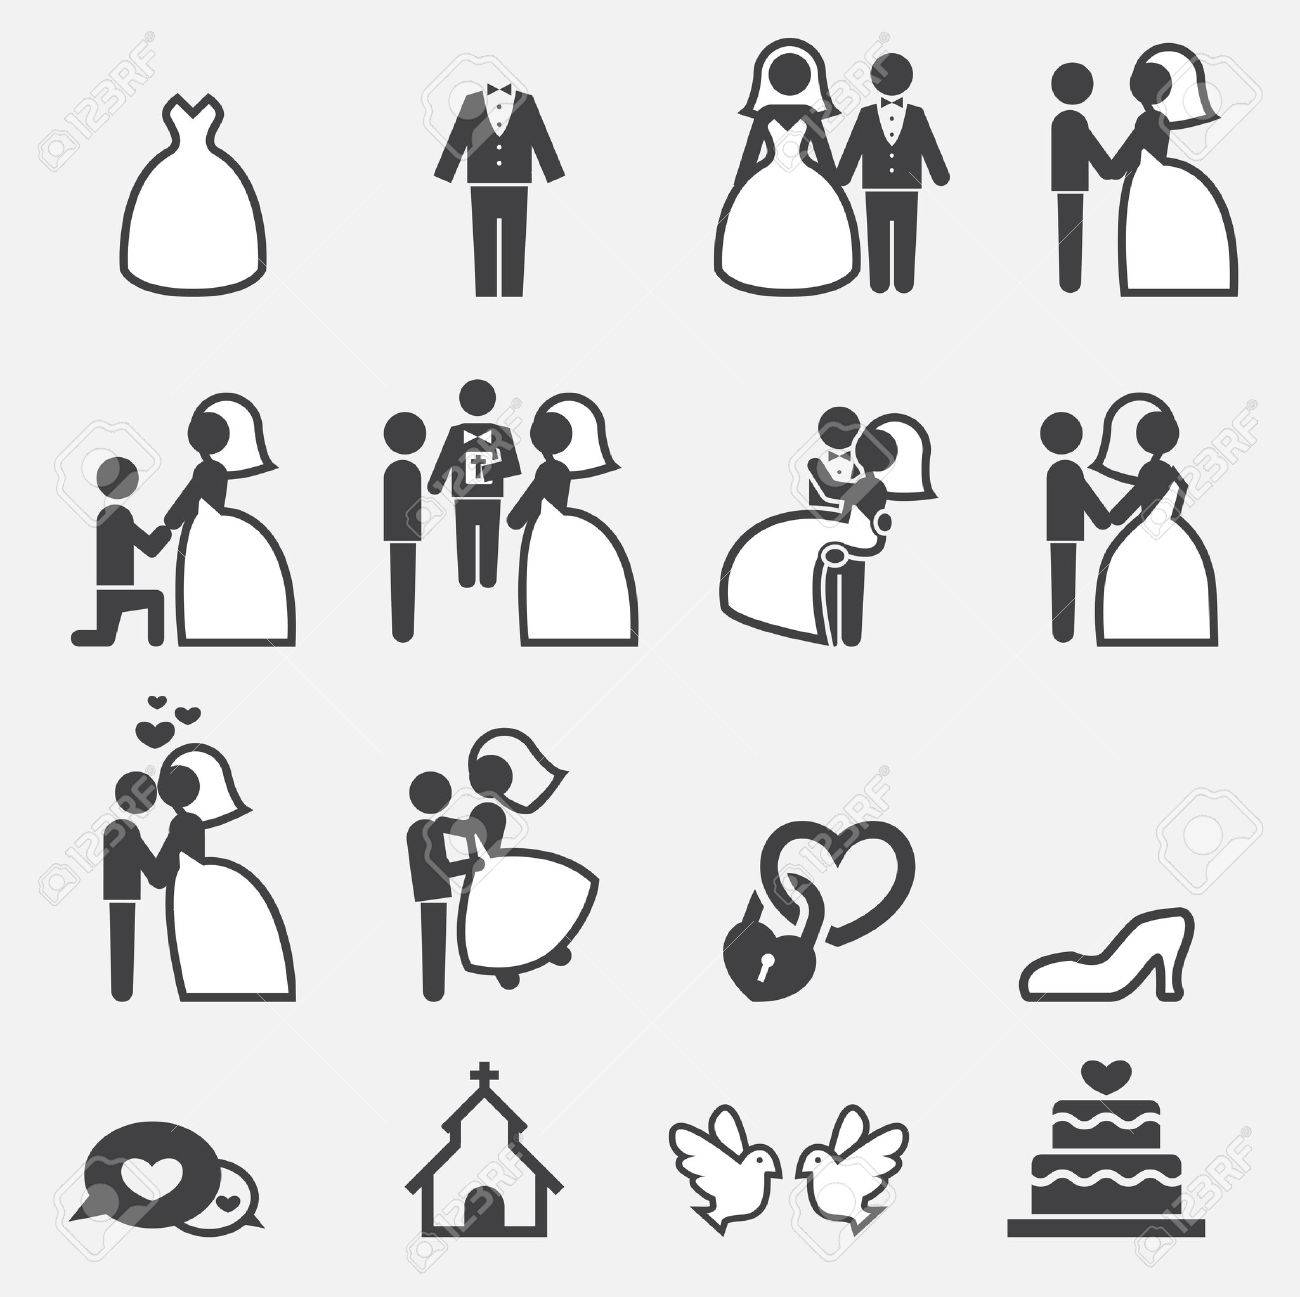 wedding icon - 37441983